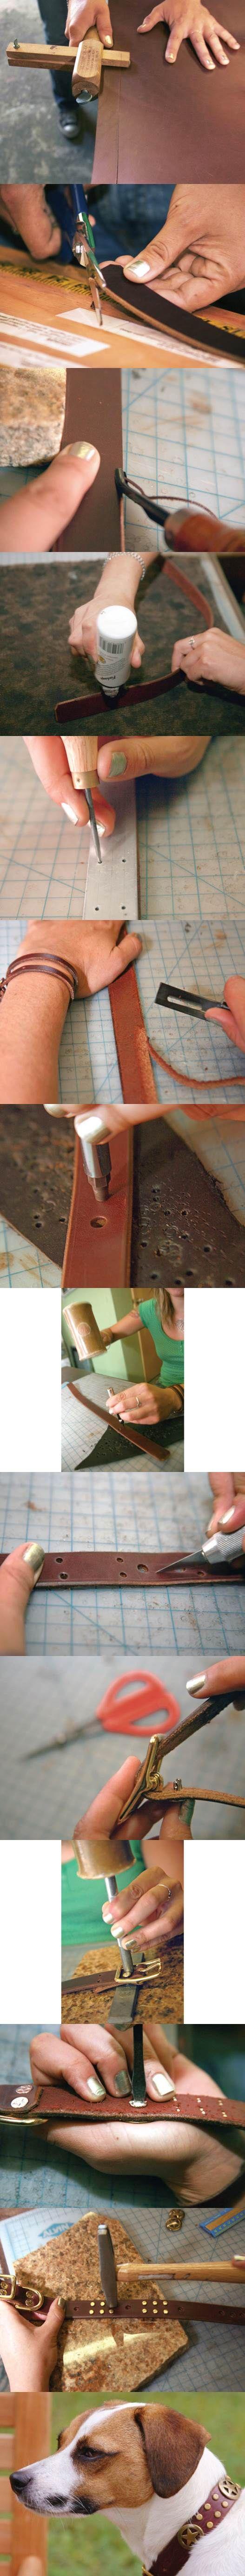 DIY Stylish Leather Dog Collar  step by step